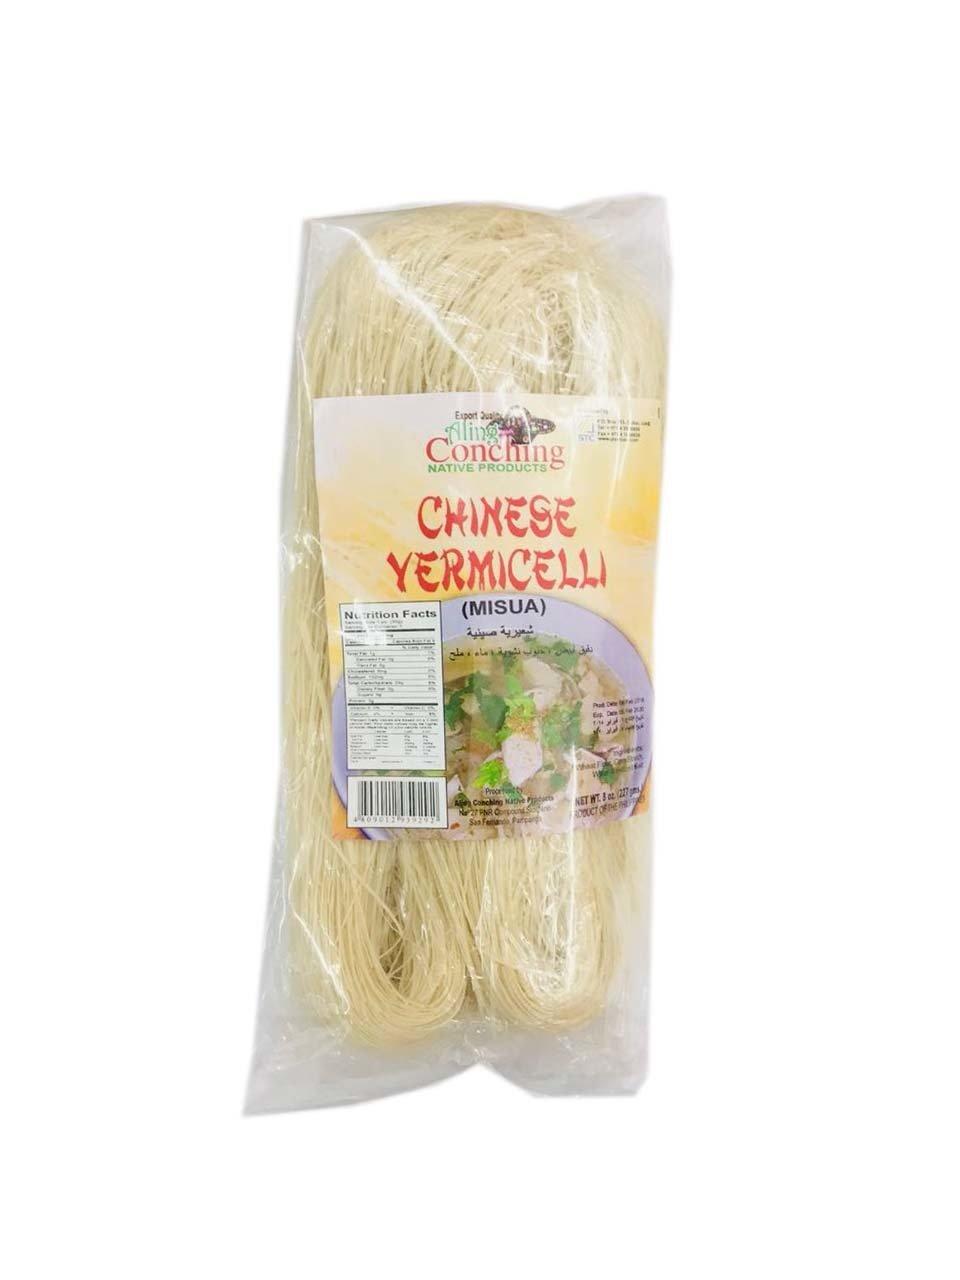 Aling Conching Chinese Vermicelli Misua 227g